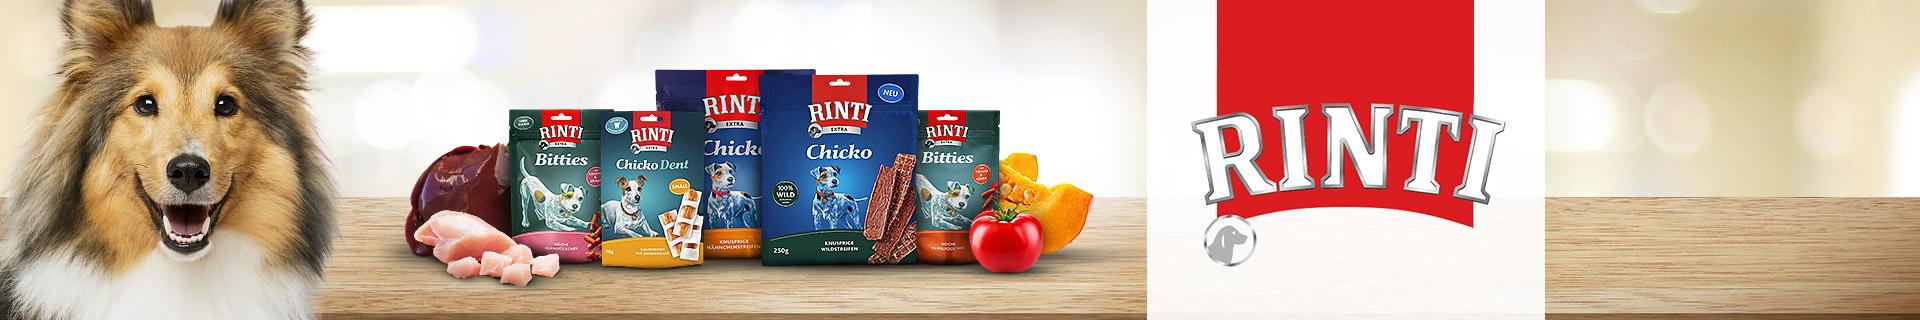 Rinti Hund Snacks Chicko Dent